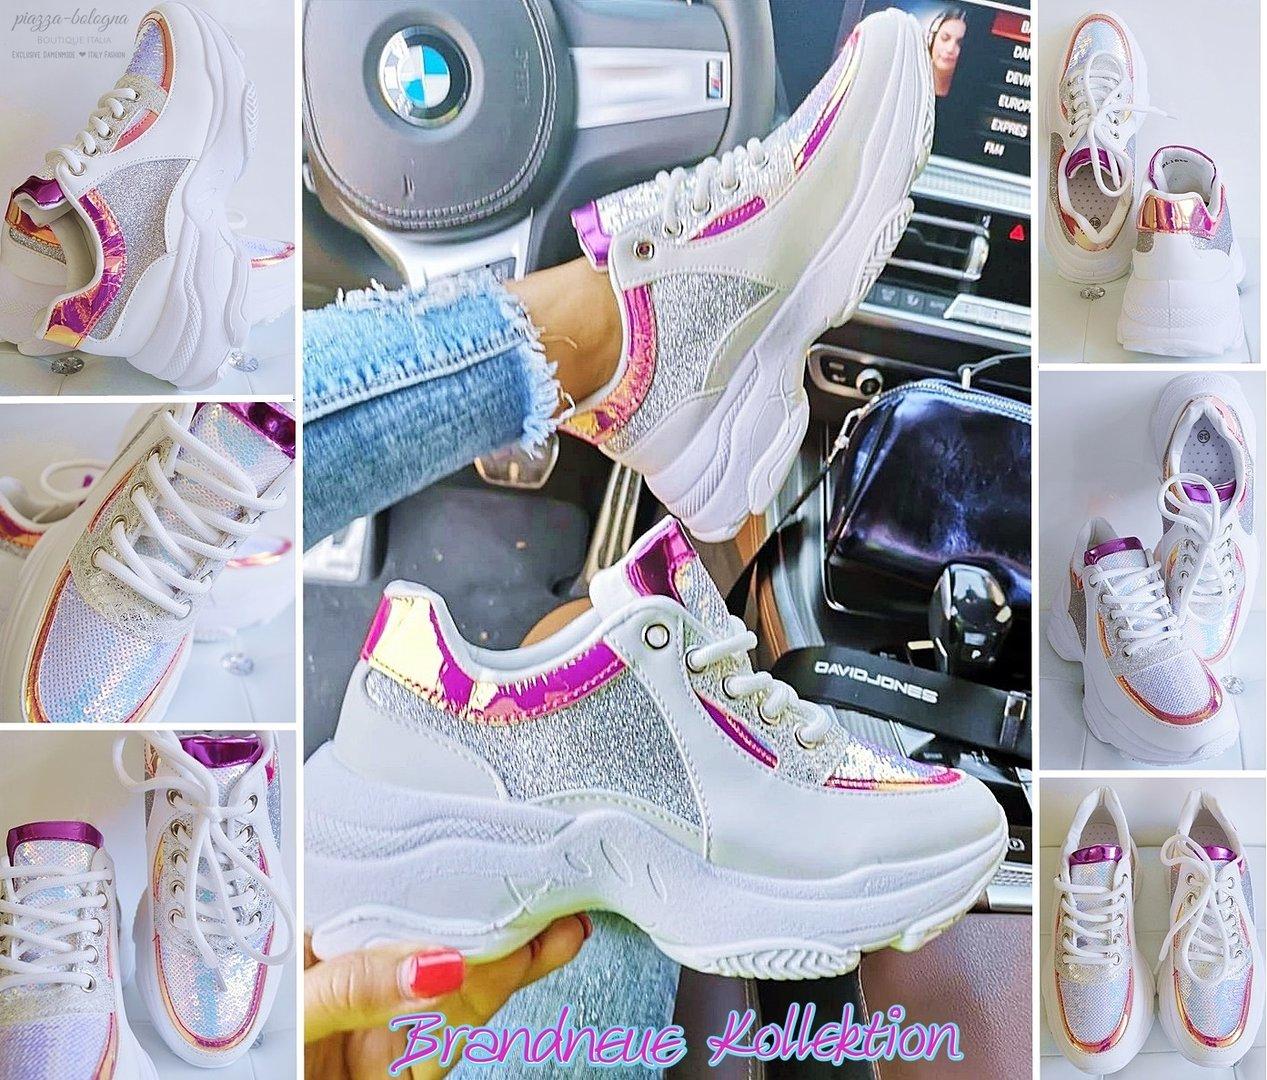 reputable site 9b7b0 f8ce7 Pailletten-Hologramm-Glitzer Sneaker Turnschuhe Weiß Silber Pink Rosa GR.  38 39 40 41